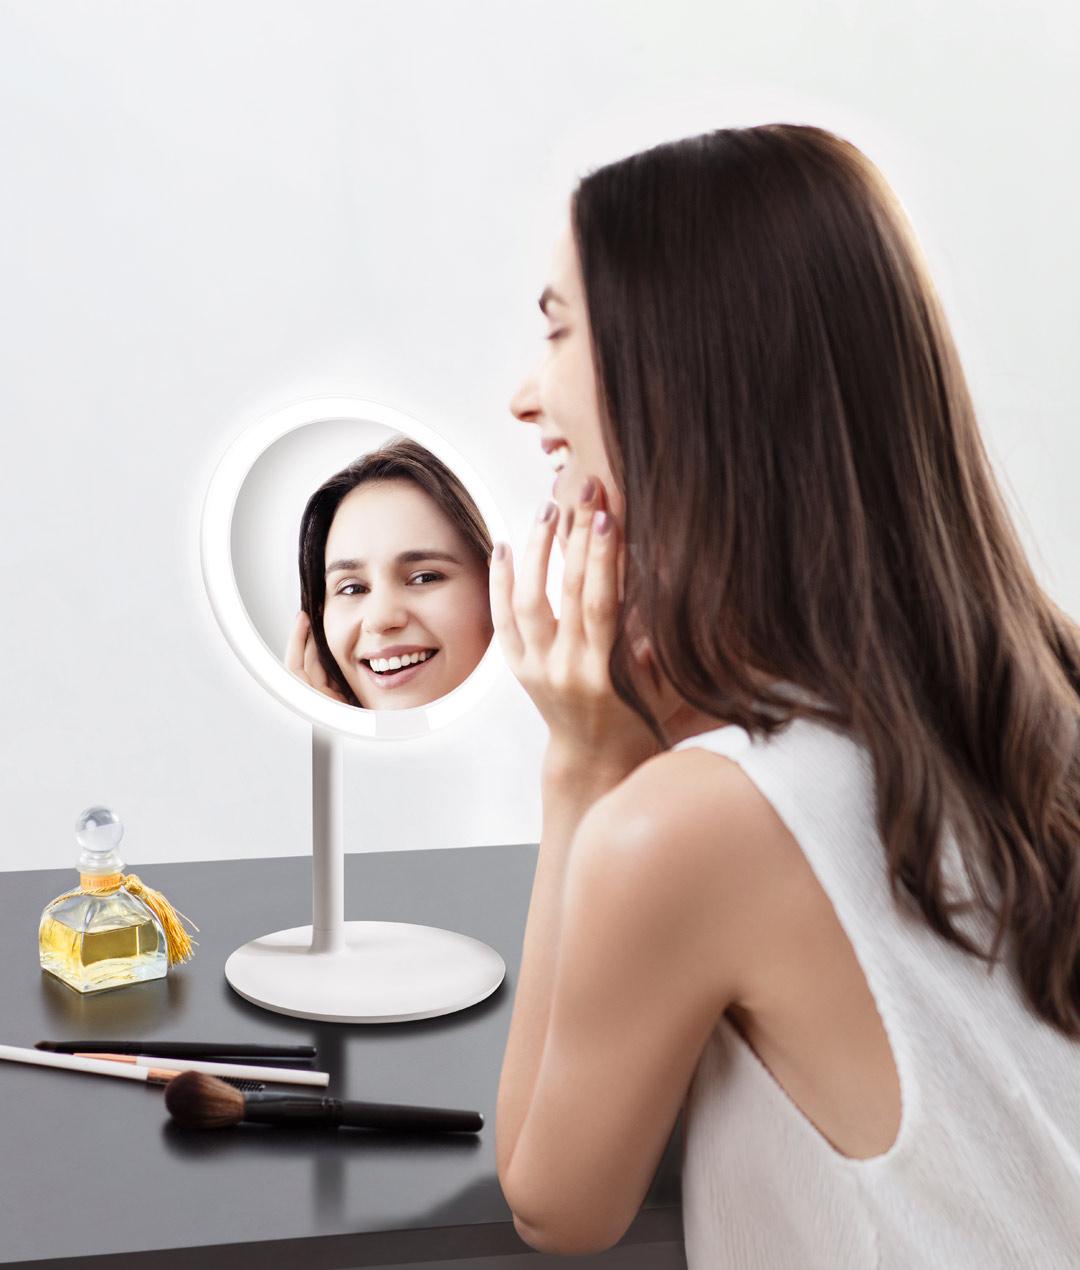 AMIRO高清日光镜 化妆镜(顺丰发货)